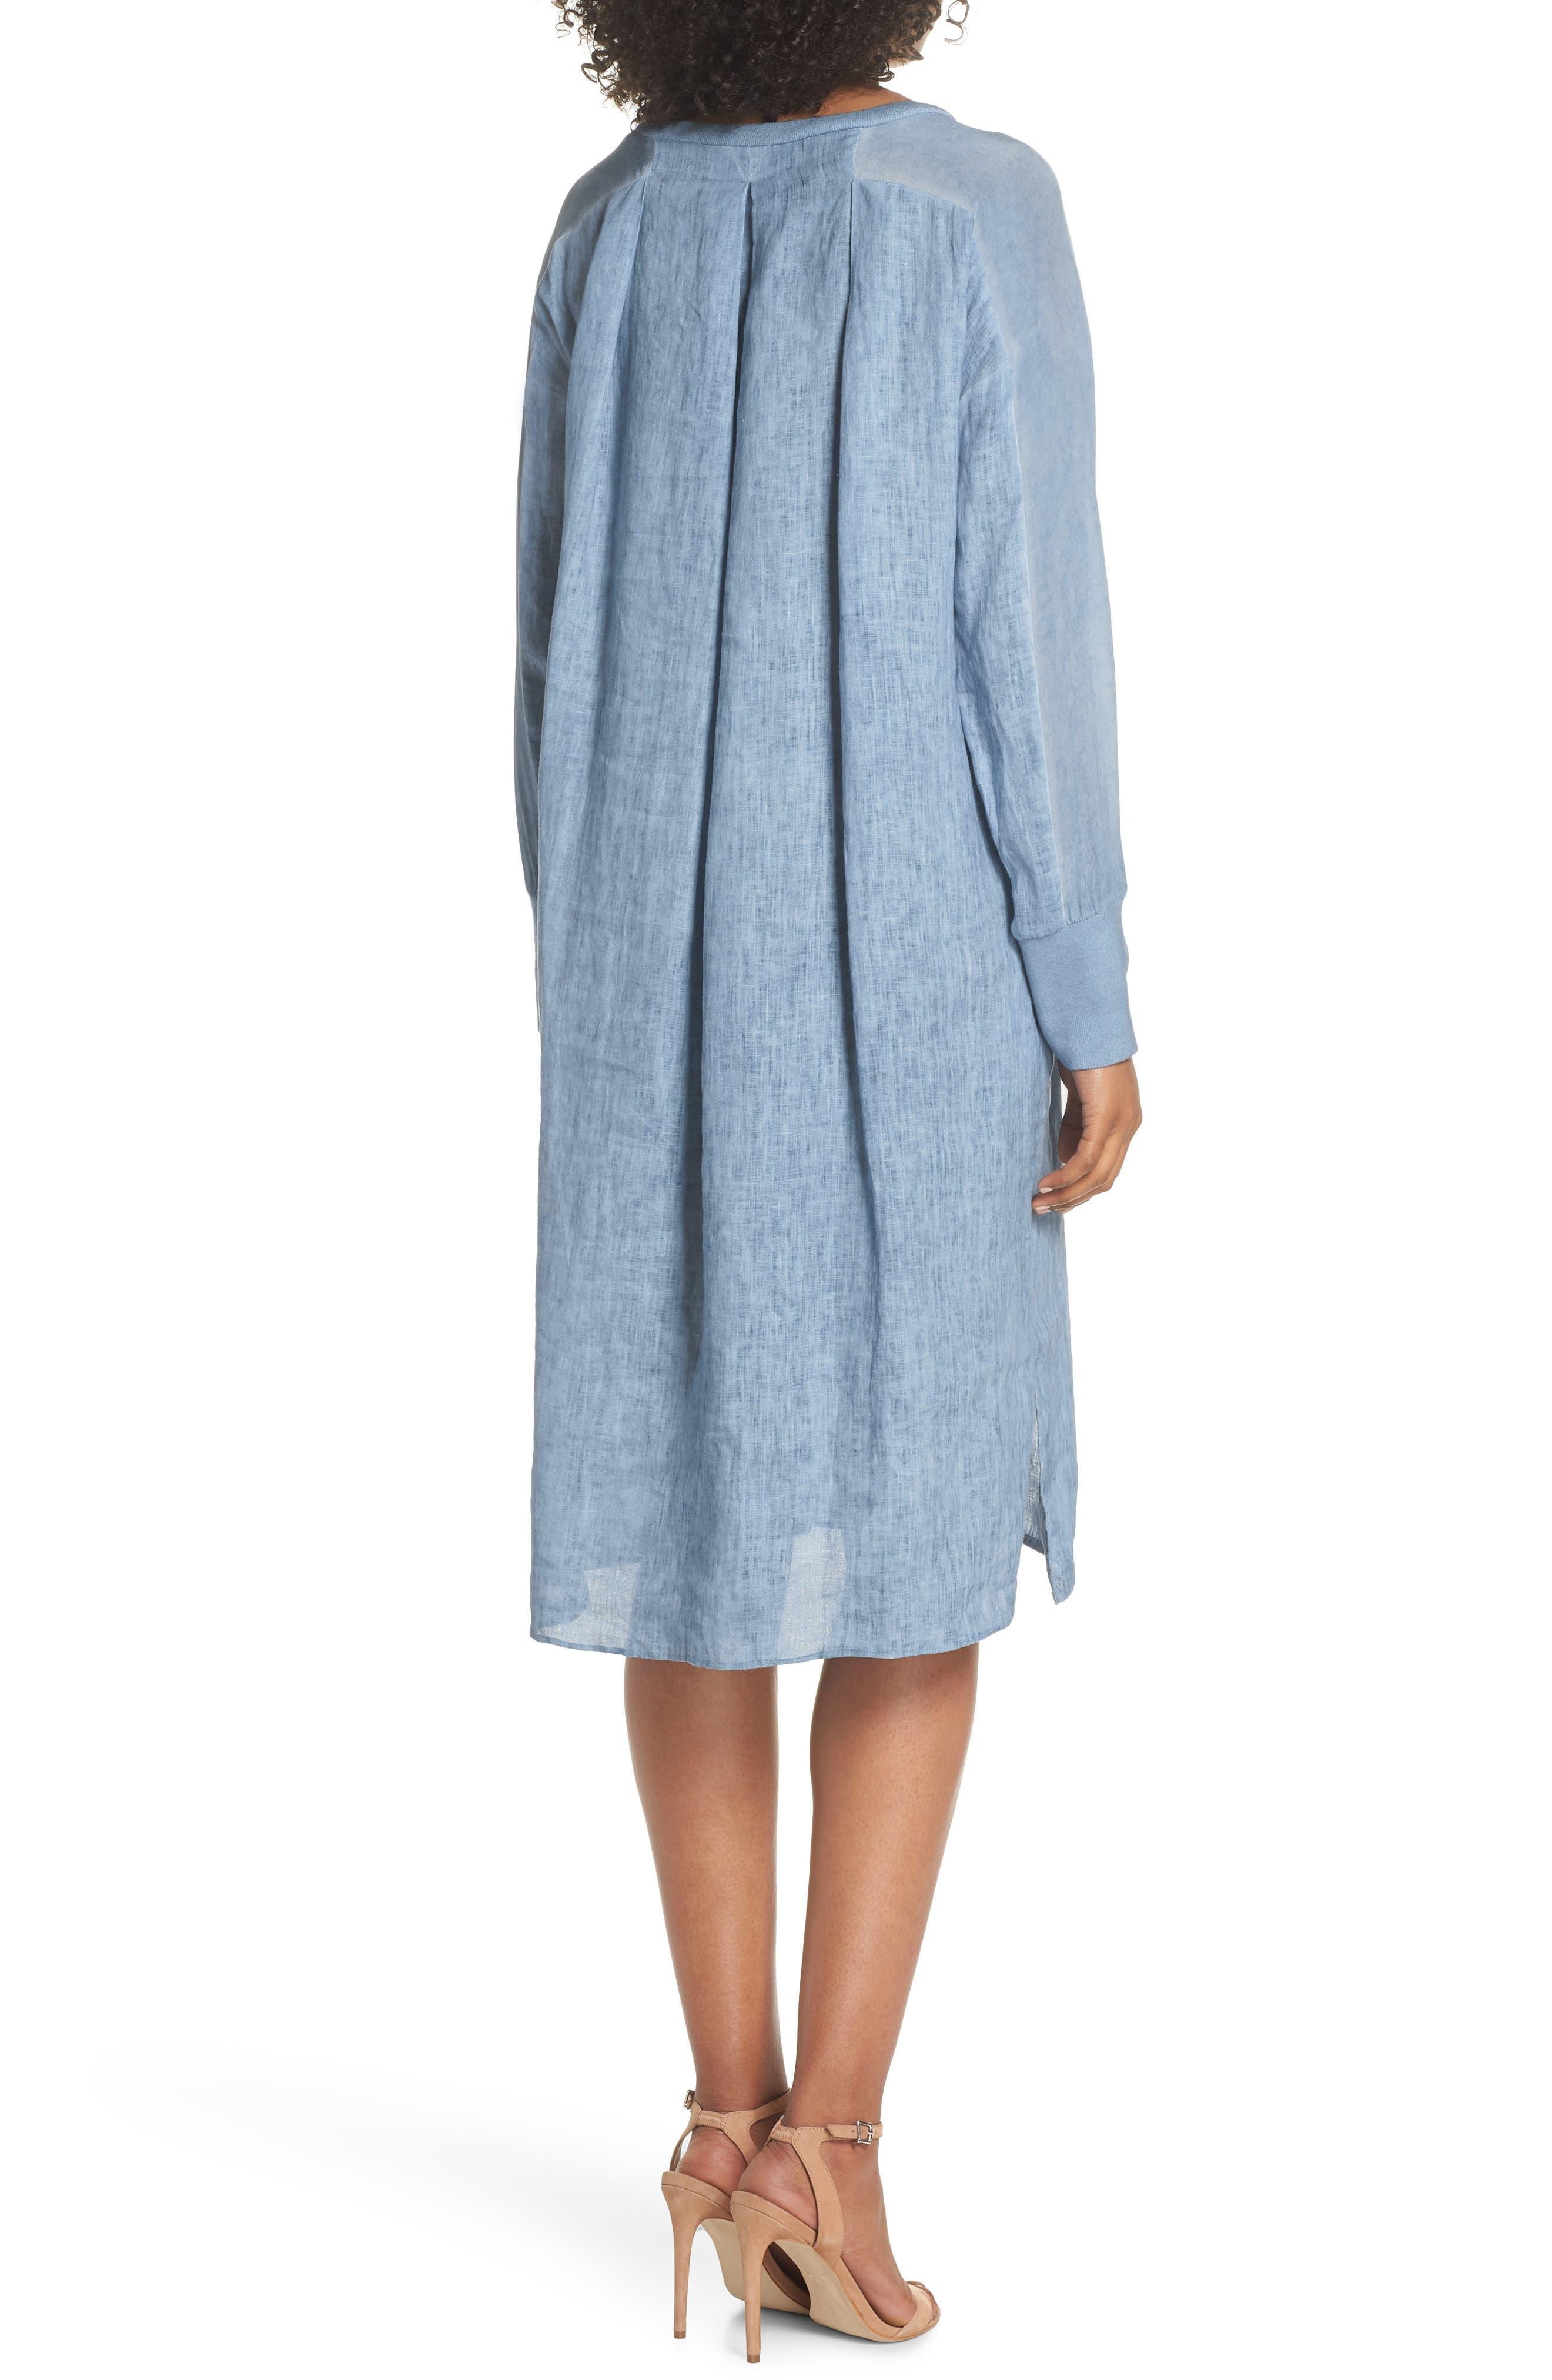 Rata Linen Shift Dress,                             Alternate thumbnail 2, color,                             400